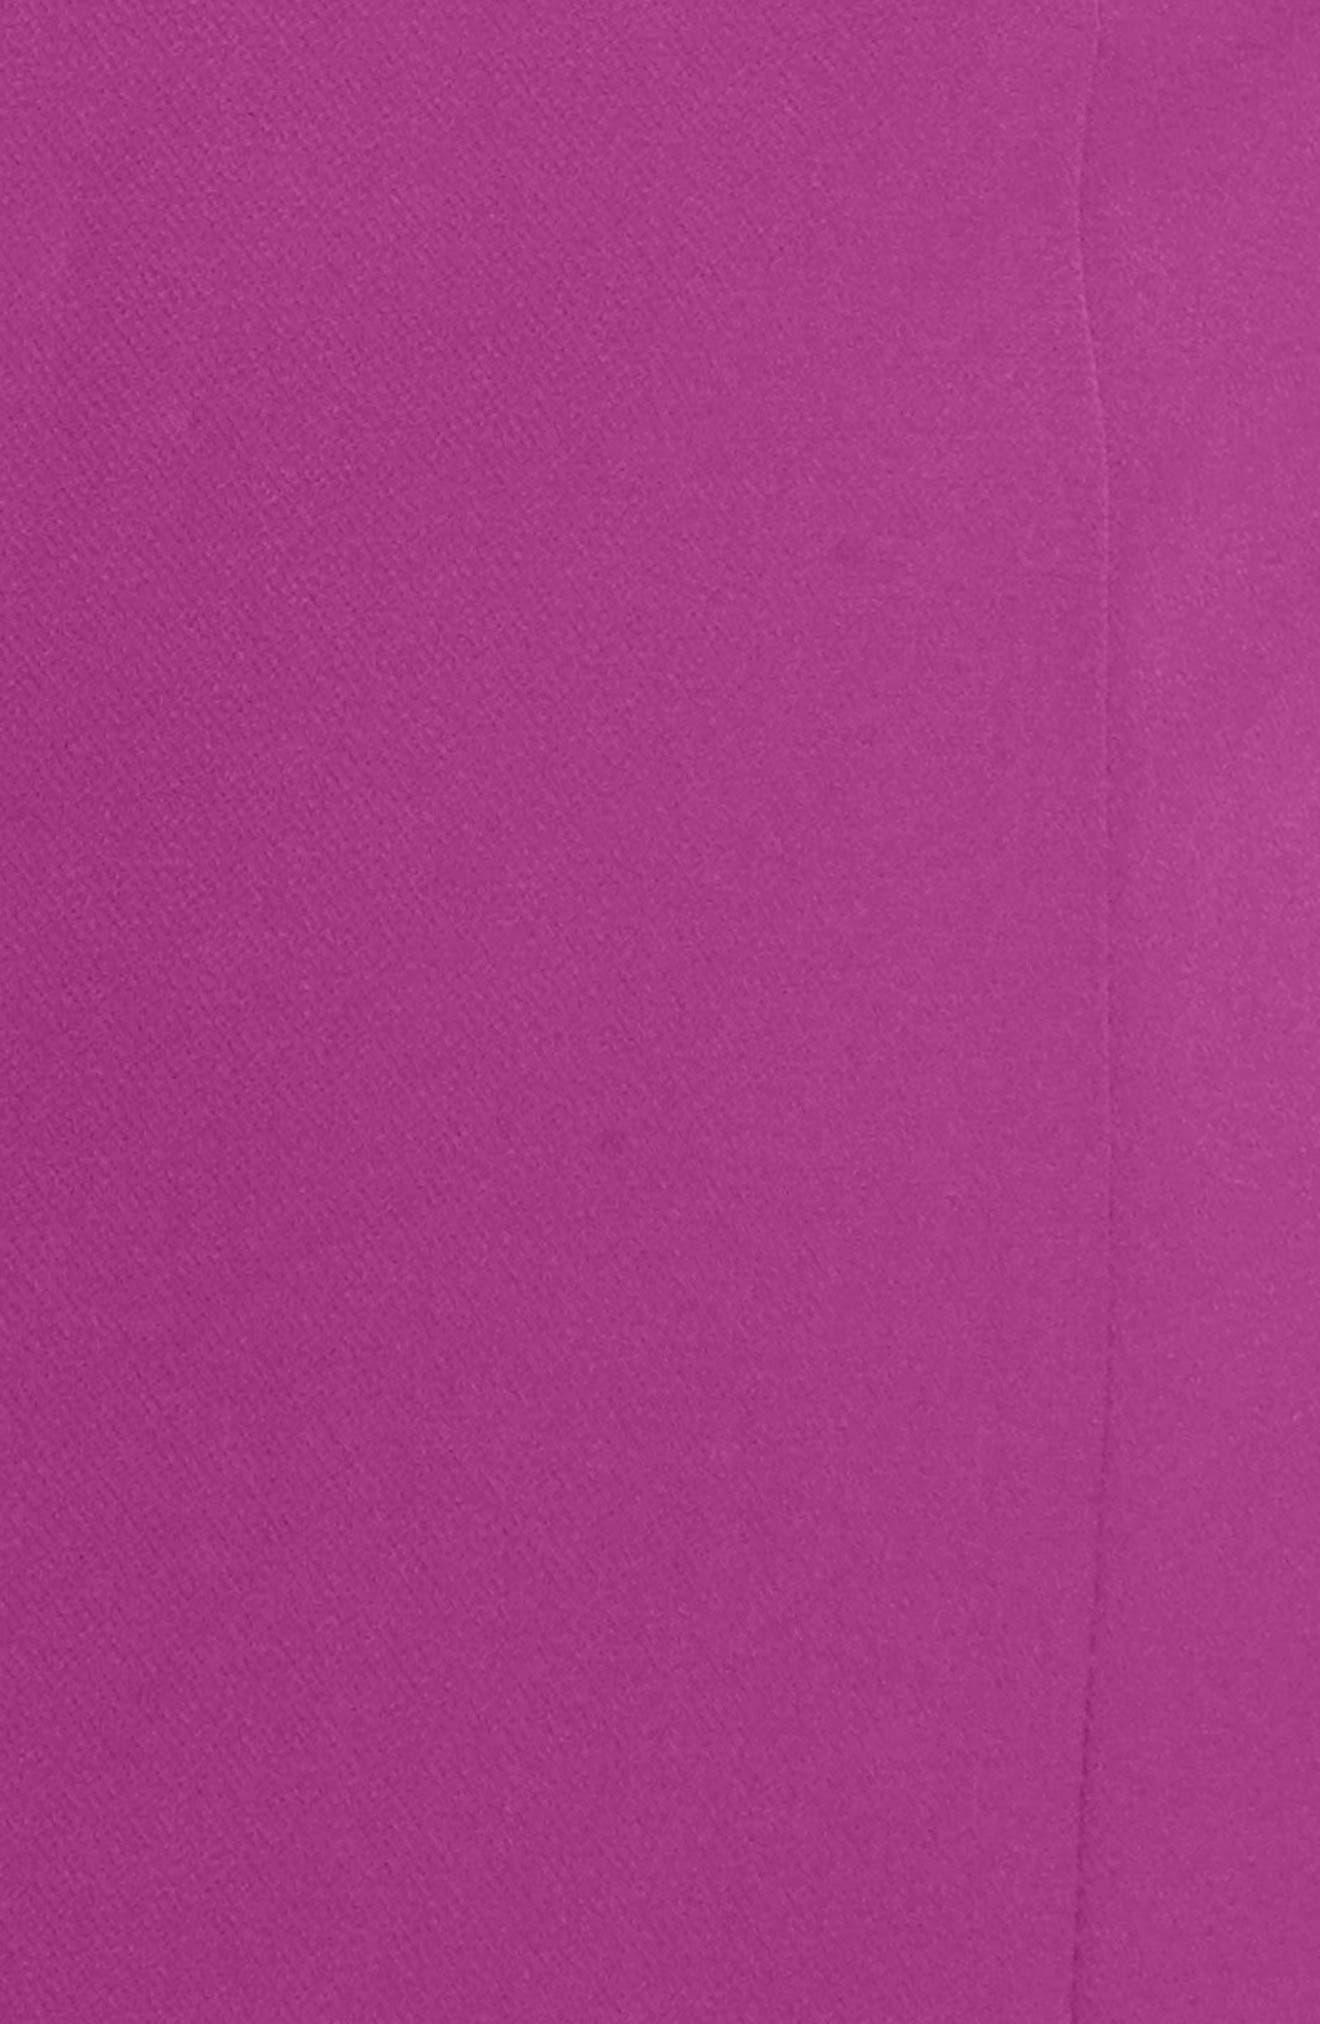 Italian Cady Gathered Sleeve Sheath Dress,                             Alternate thumbnail 6, color,                             569